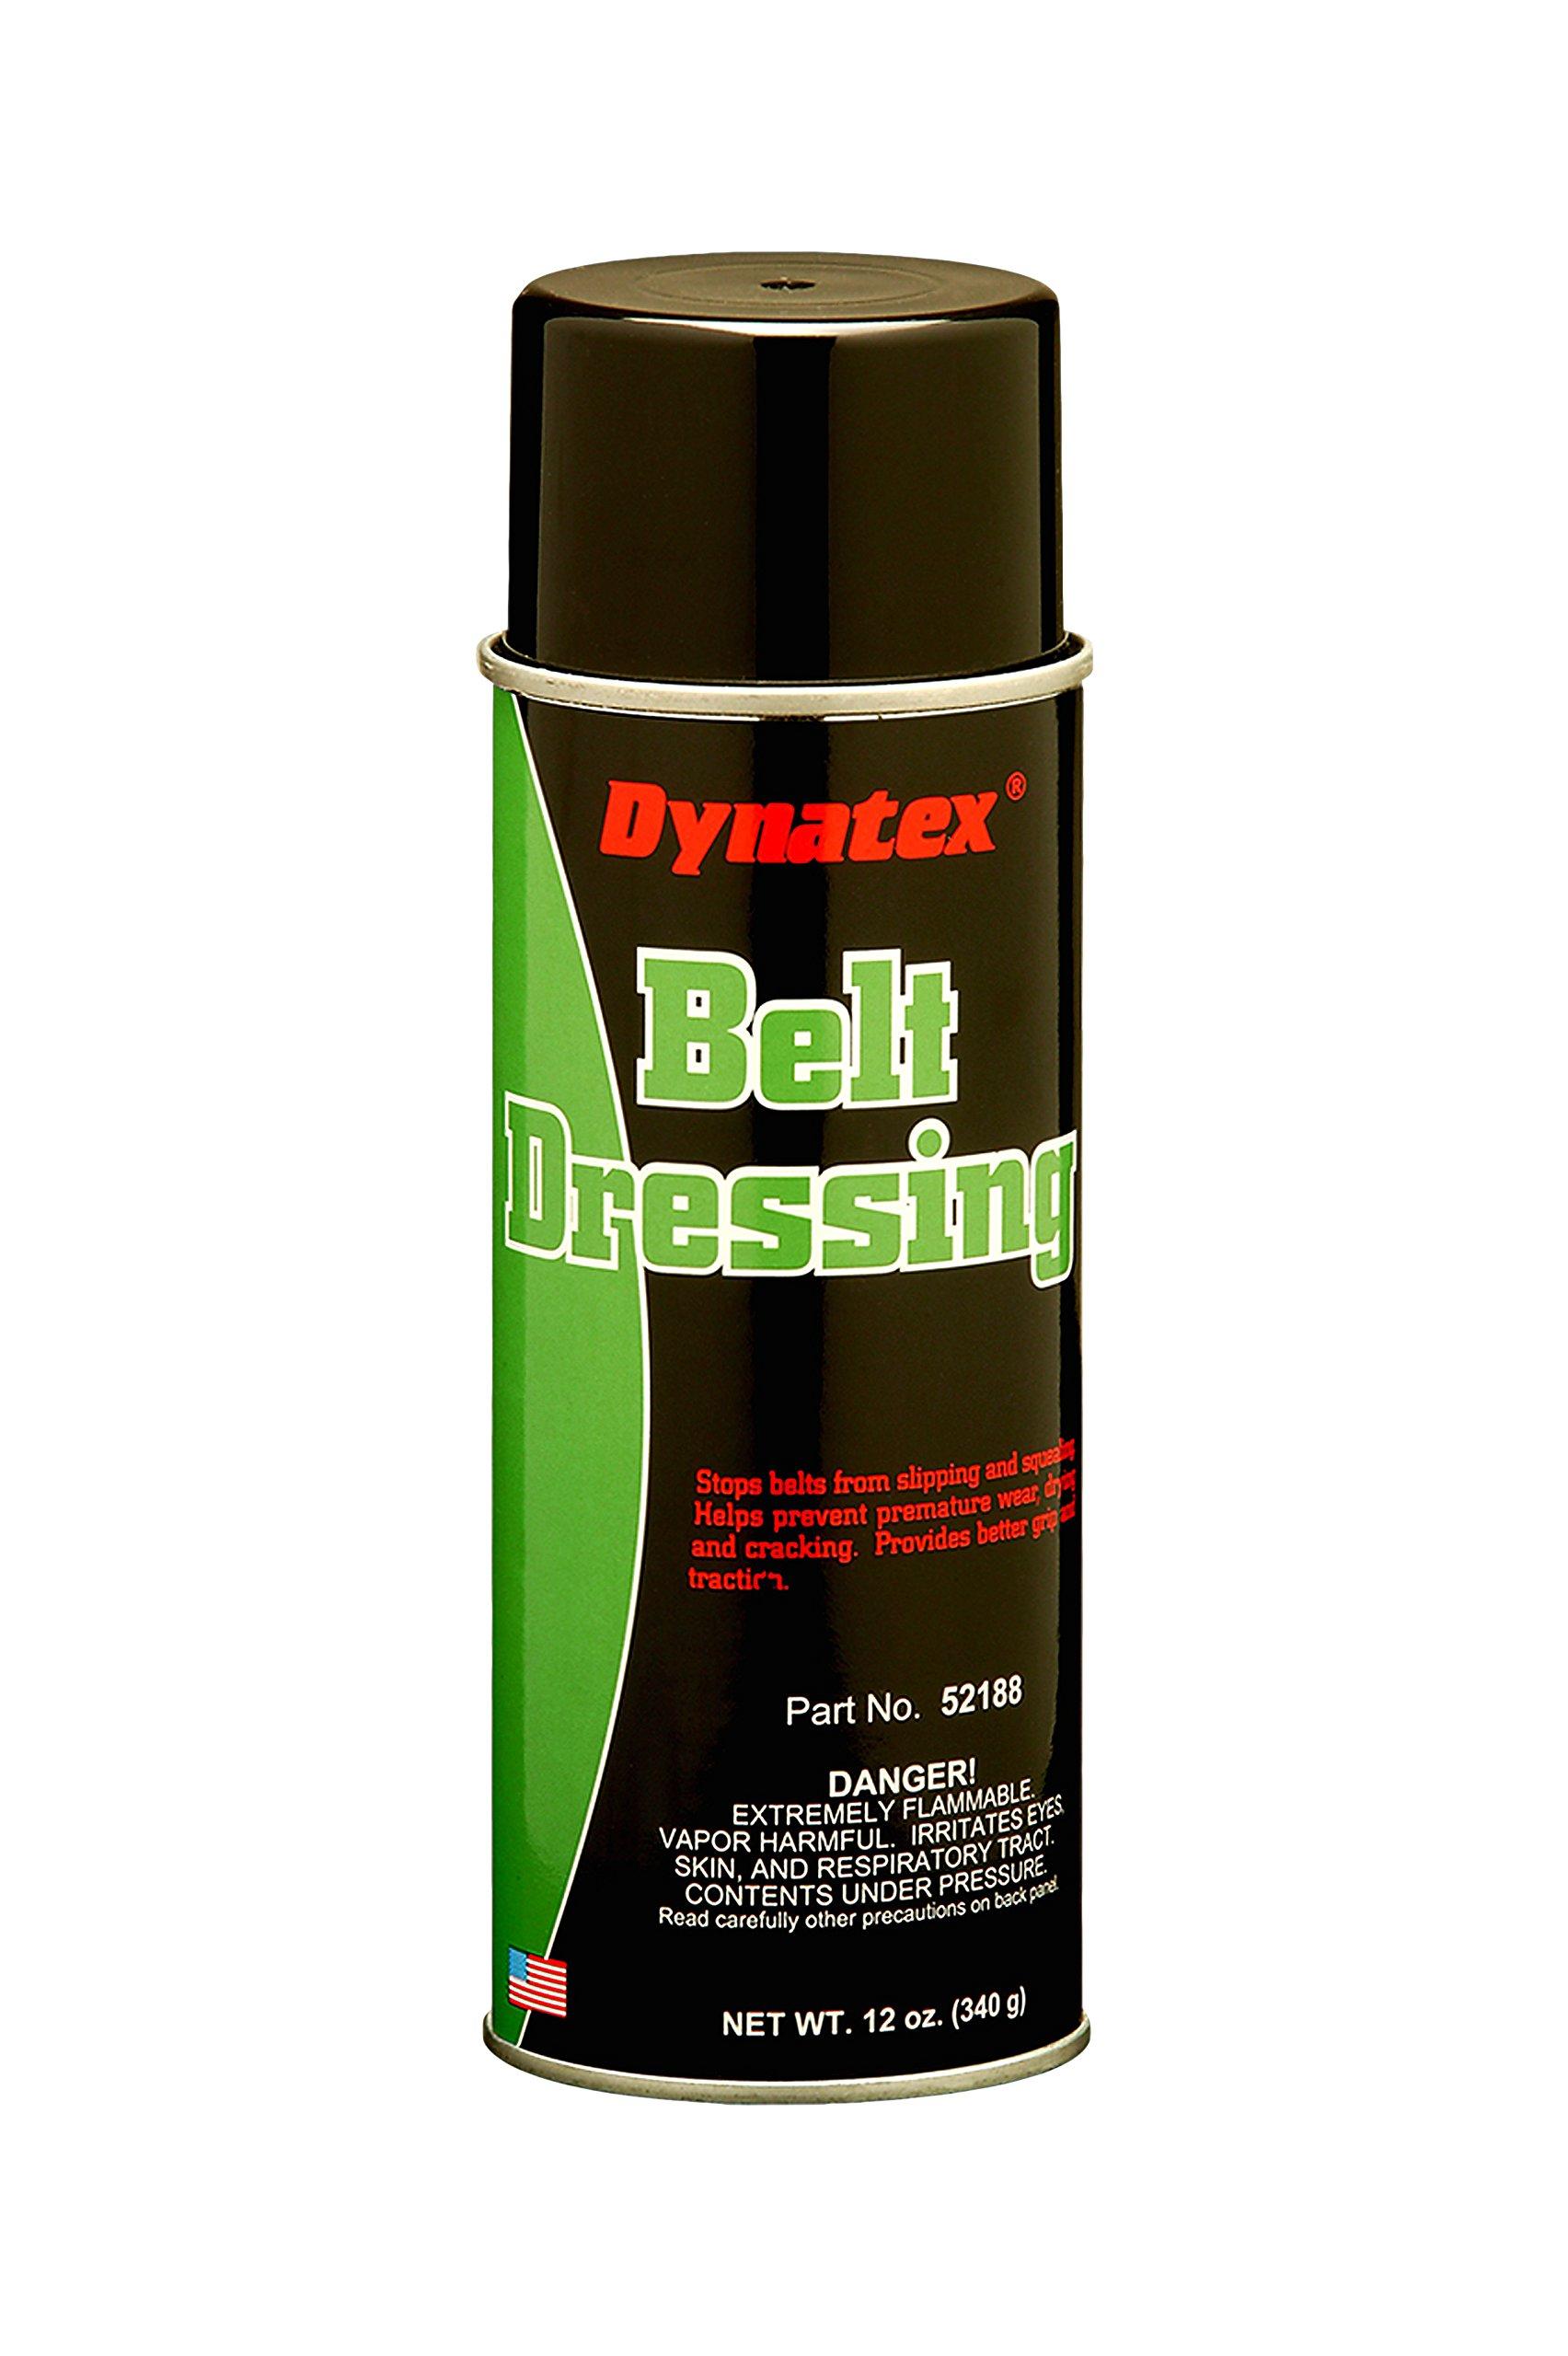 Dynatex 52188 Belt Dressing Spray, 16 oz Aerosol Can, White (Pack of 12)